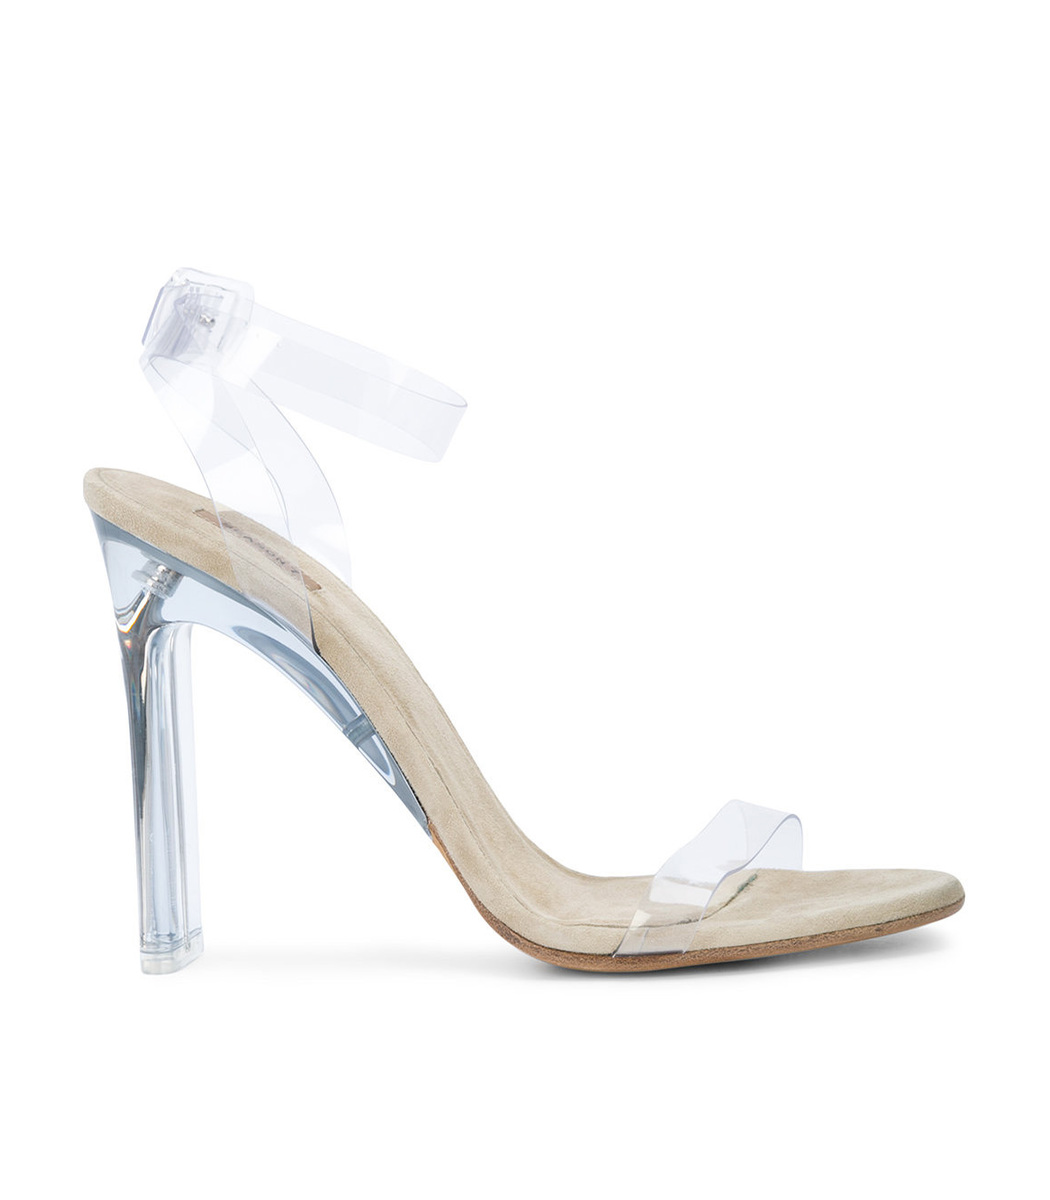 Clear PVC Sandals